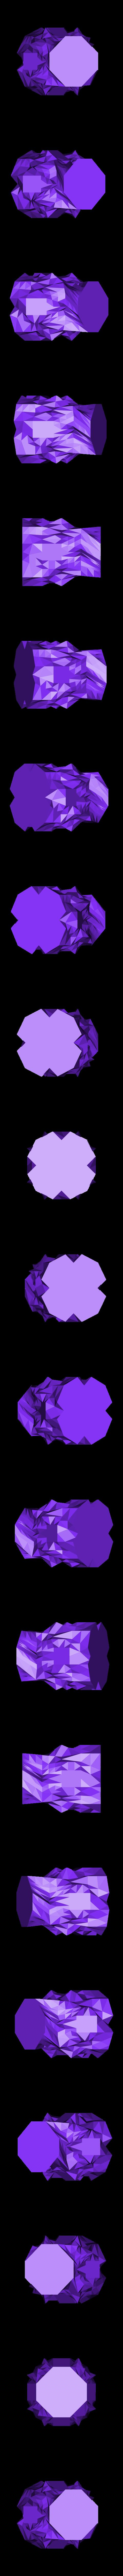 vase05.stl Download free STL file Vase of Carpet No. 01 • Object to 3D print, BAYA